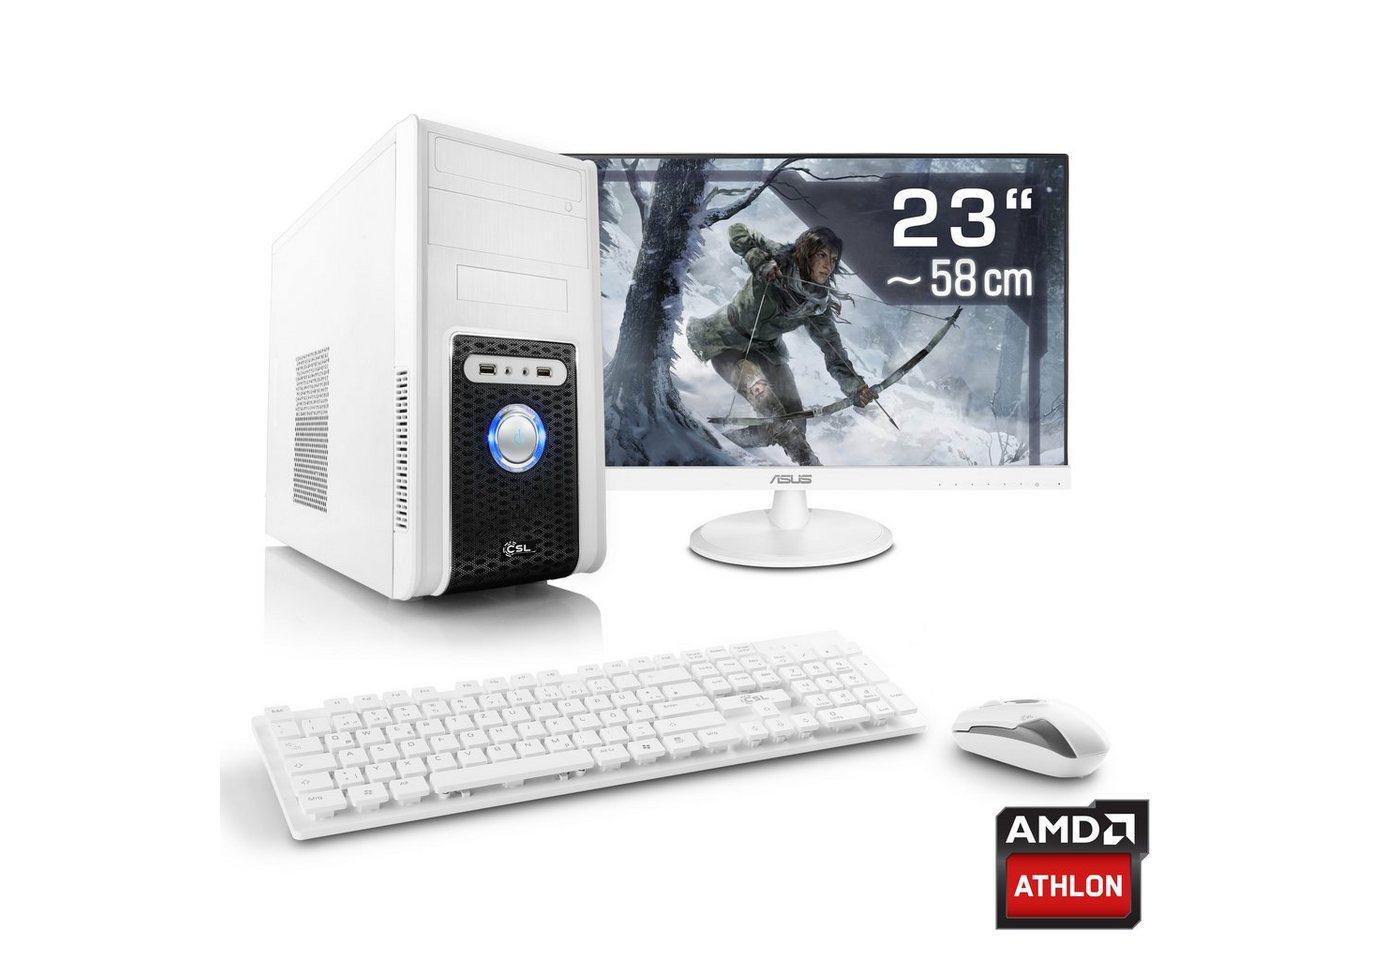 CSL Gaming PC Set Athlon X4 950   GTX 1050   8GB RAM   23 TFT »Sprint T4911 Windows 10 Home« - Preisvergleich